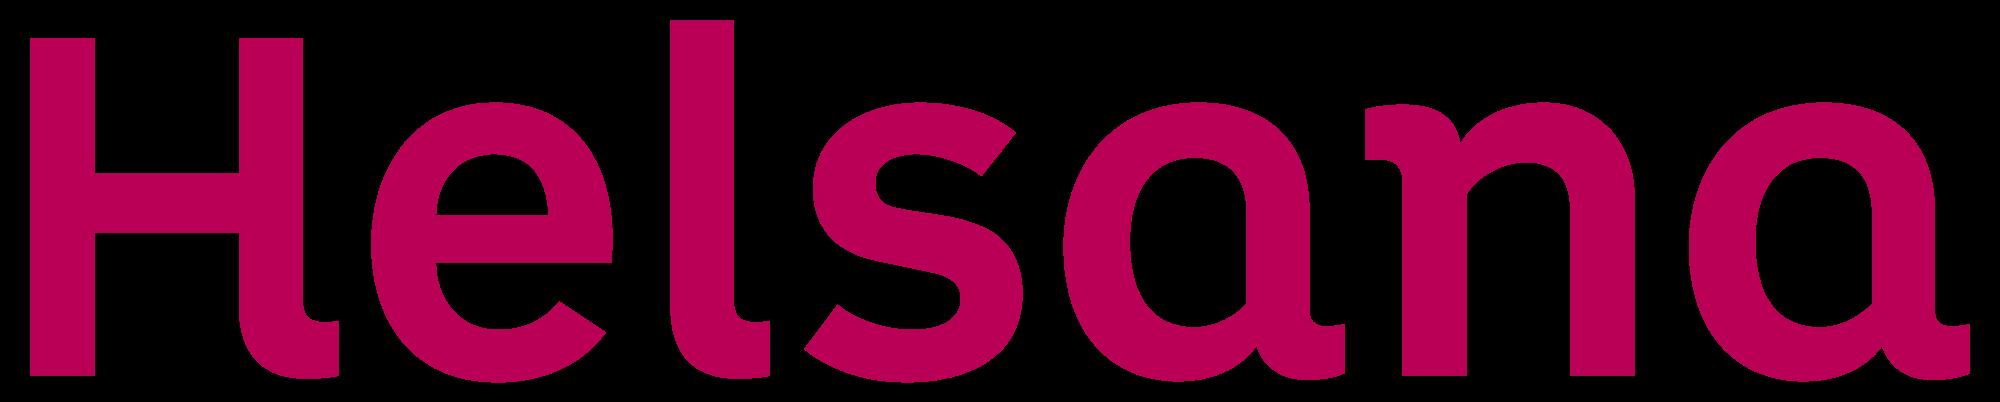 2000px-Logo_Helsana.svg